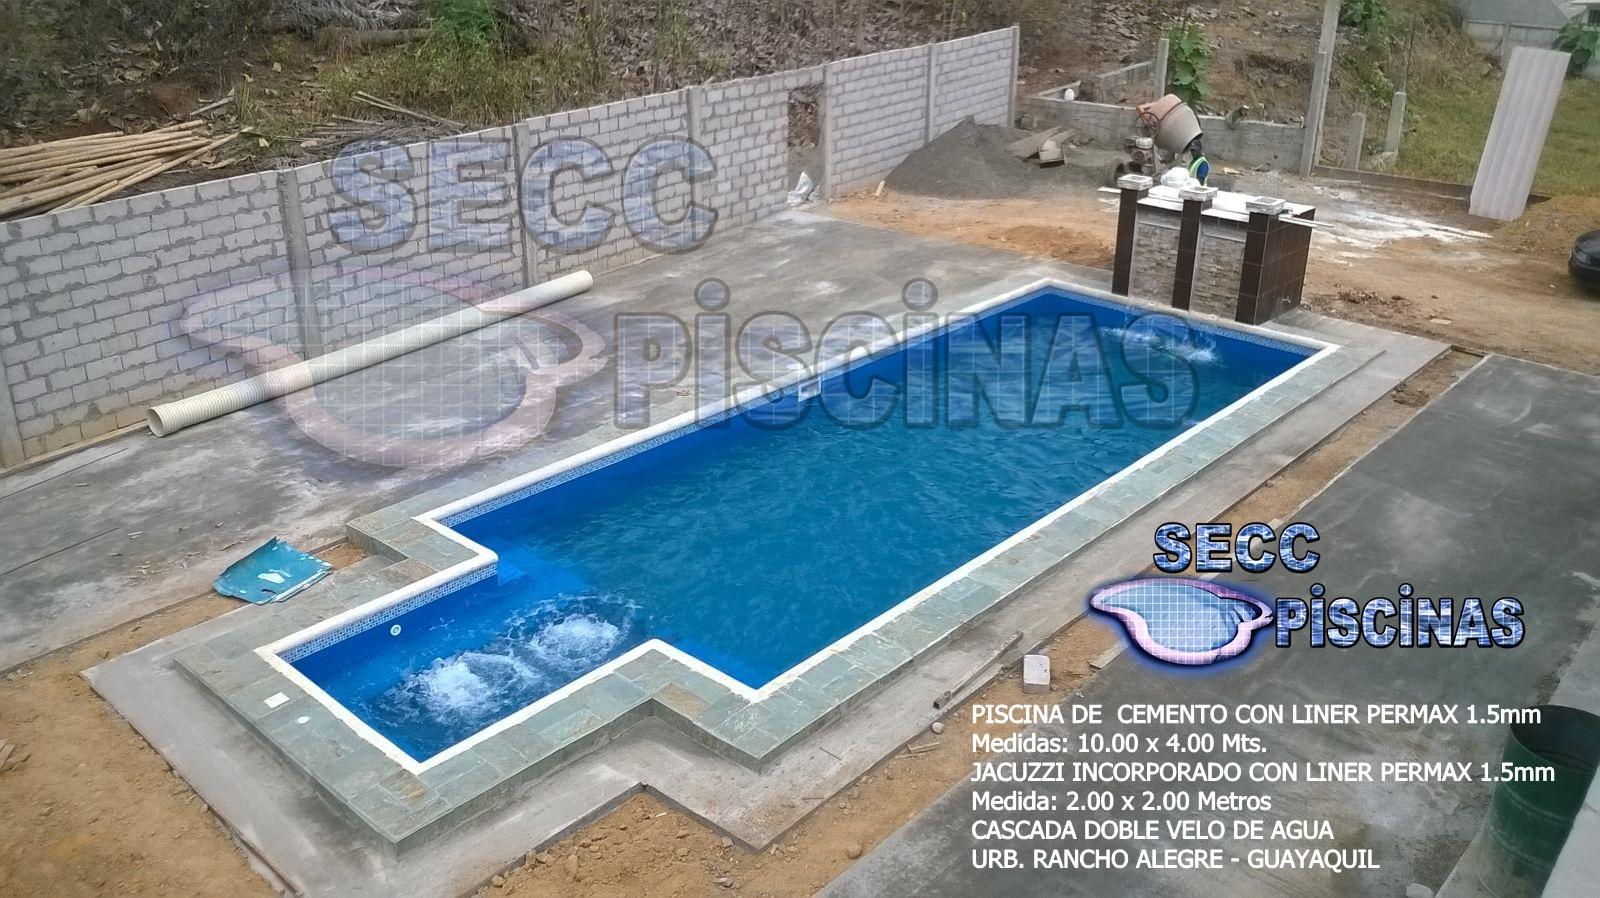 Secc piscinas piscinas con jacuzzi incorporado en liner for Piscinas jacuzzi